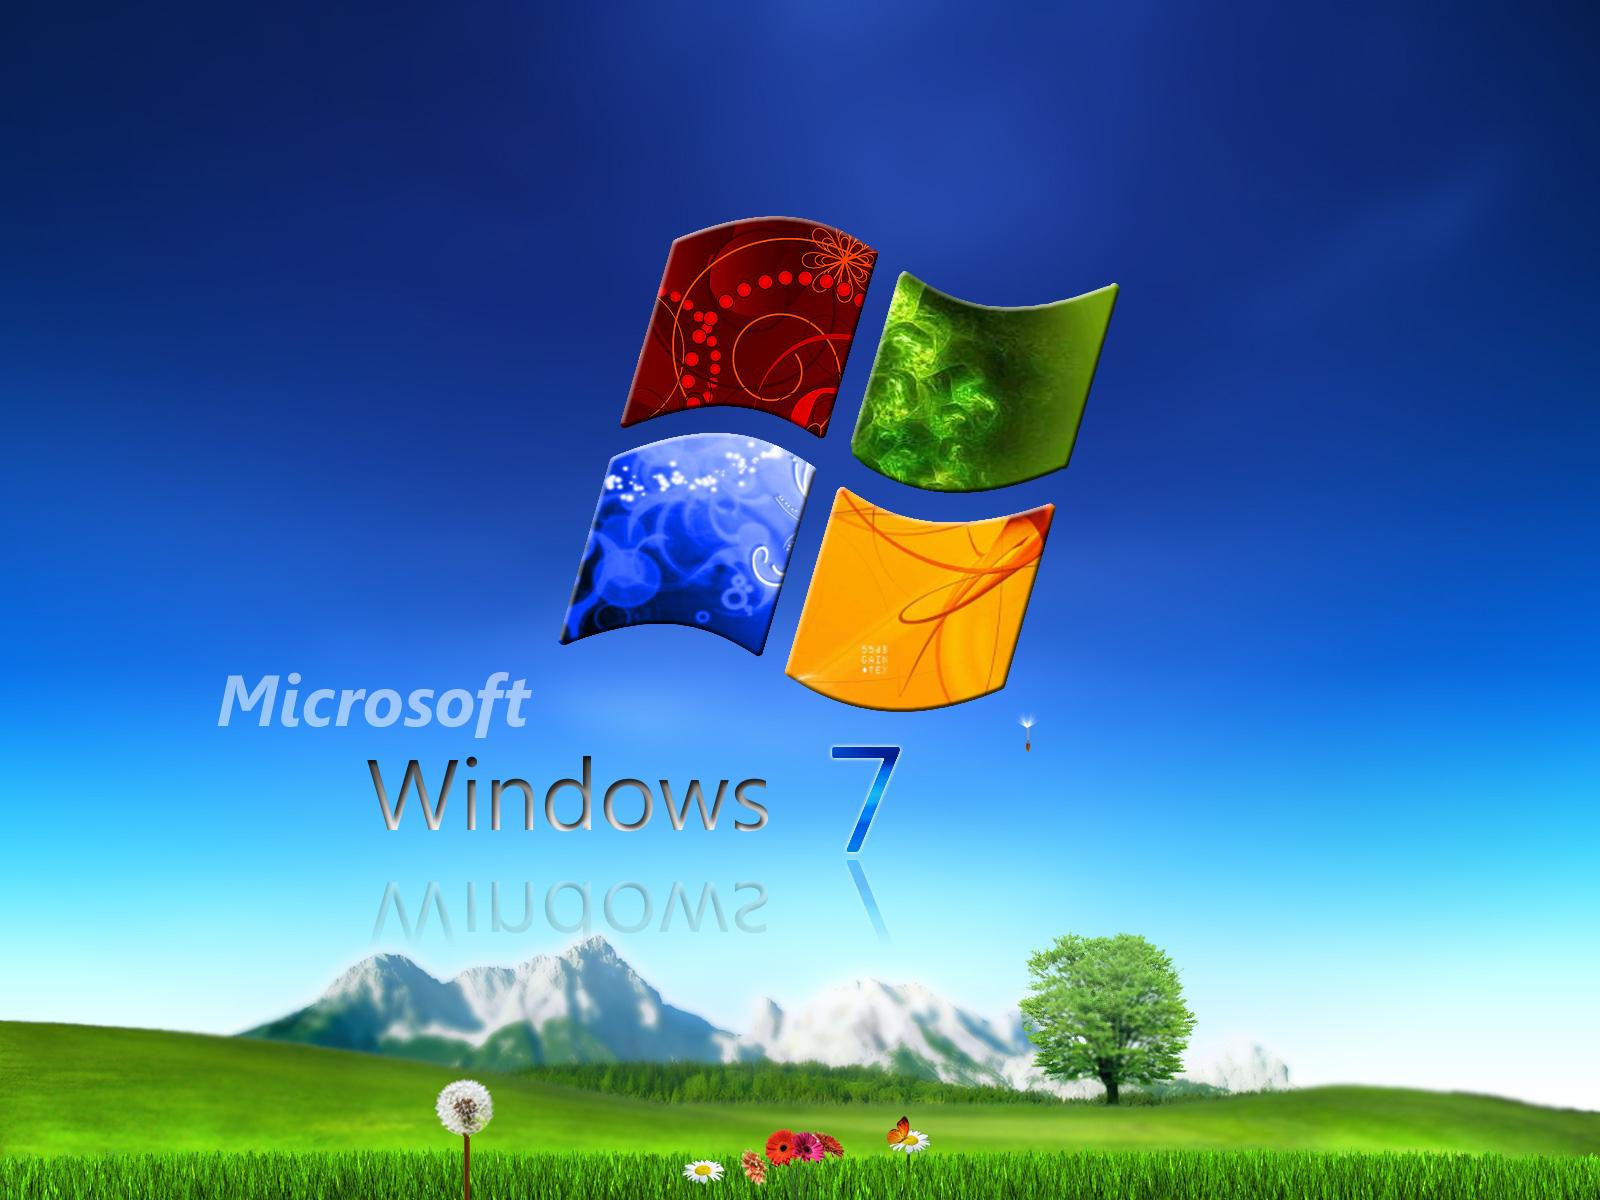 Windows Microsoft Image wallpaper brands and logos Wallpaper 1600x1200